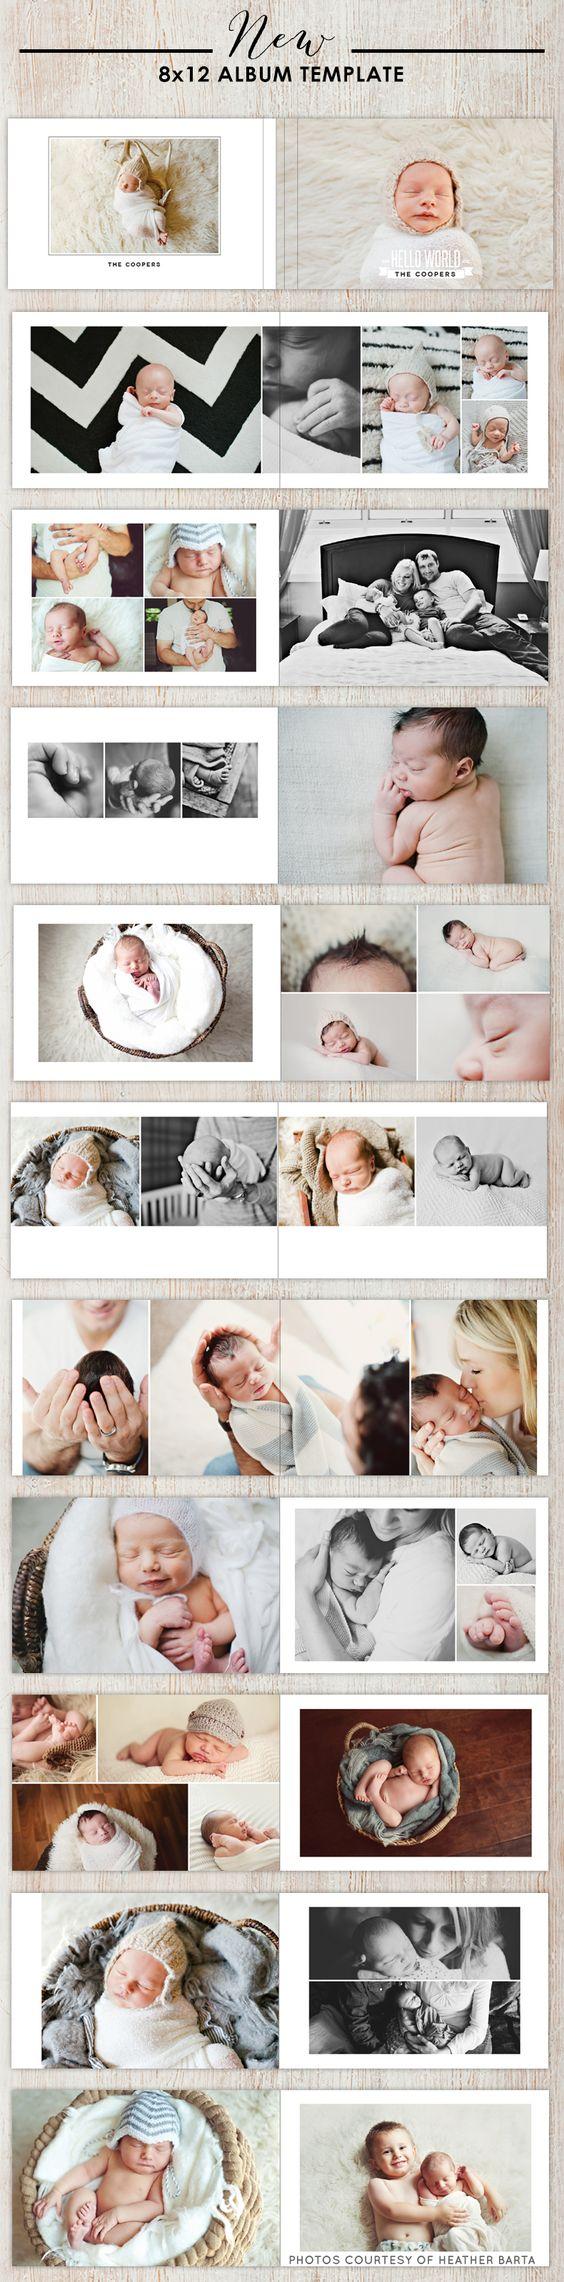 NEW versatile 8x12 album photoshop templates - designs for photographers - all occasion photography album